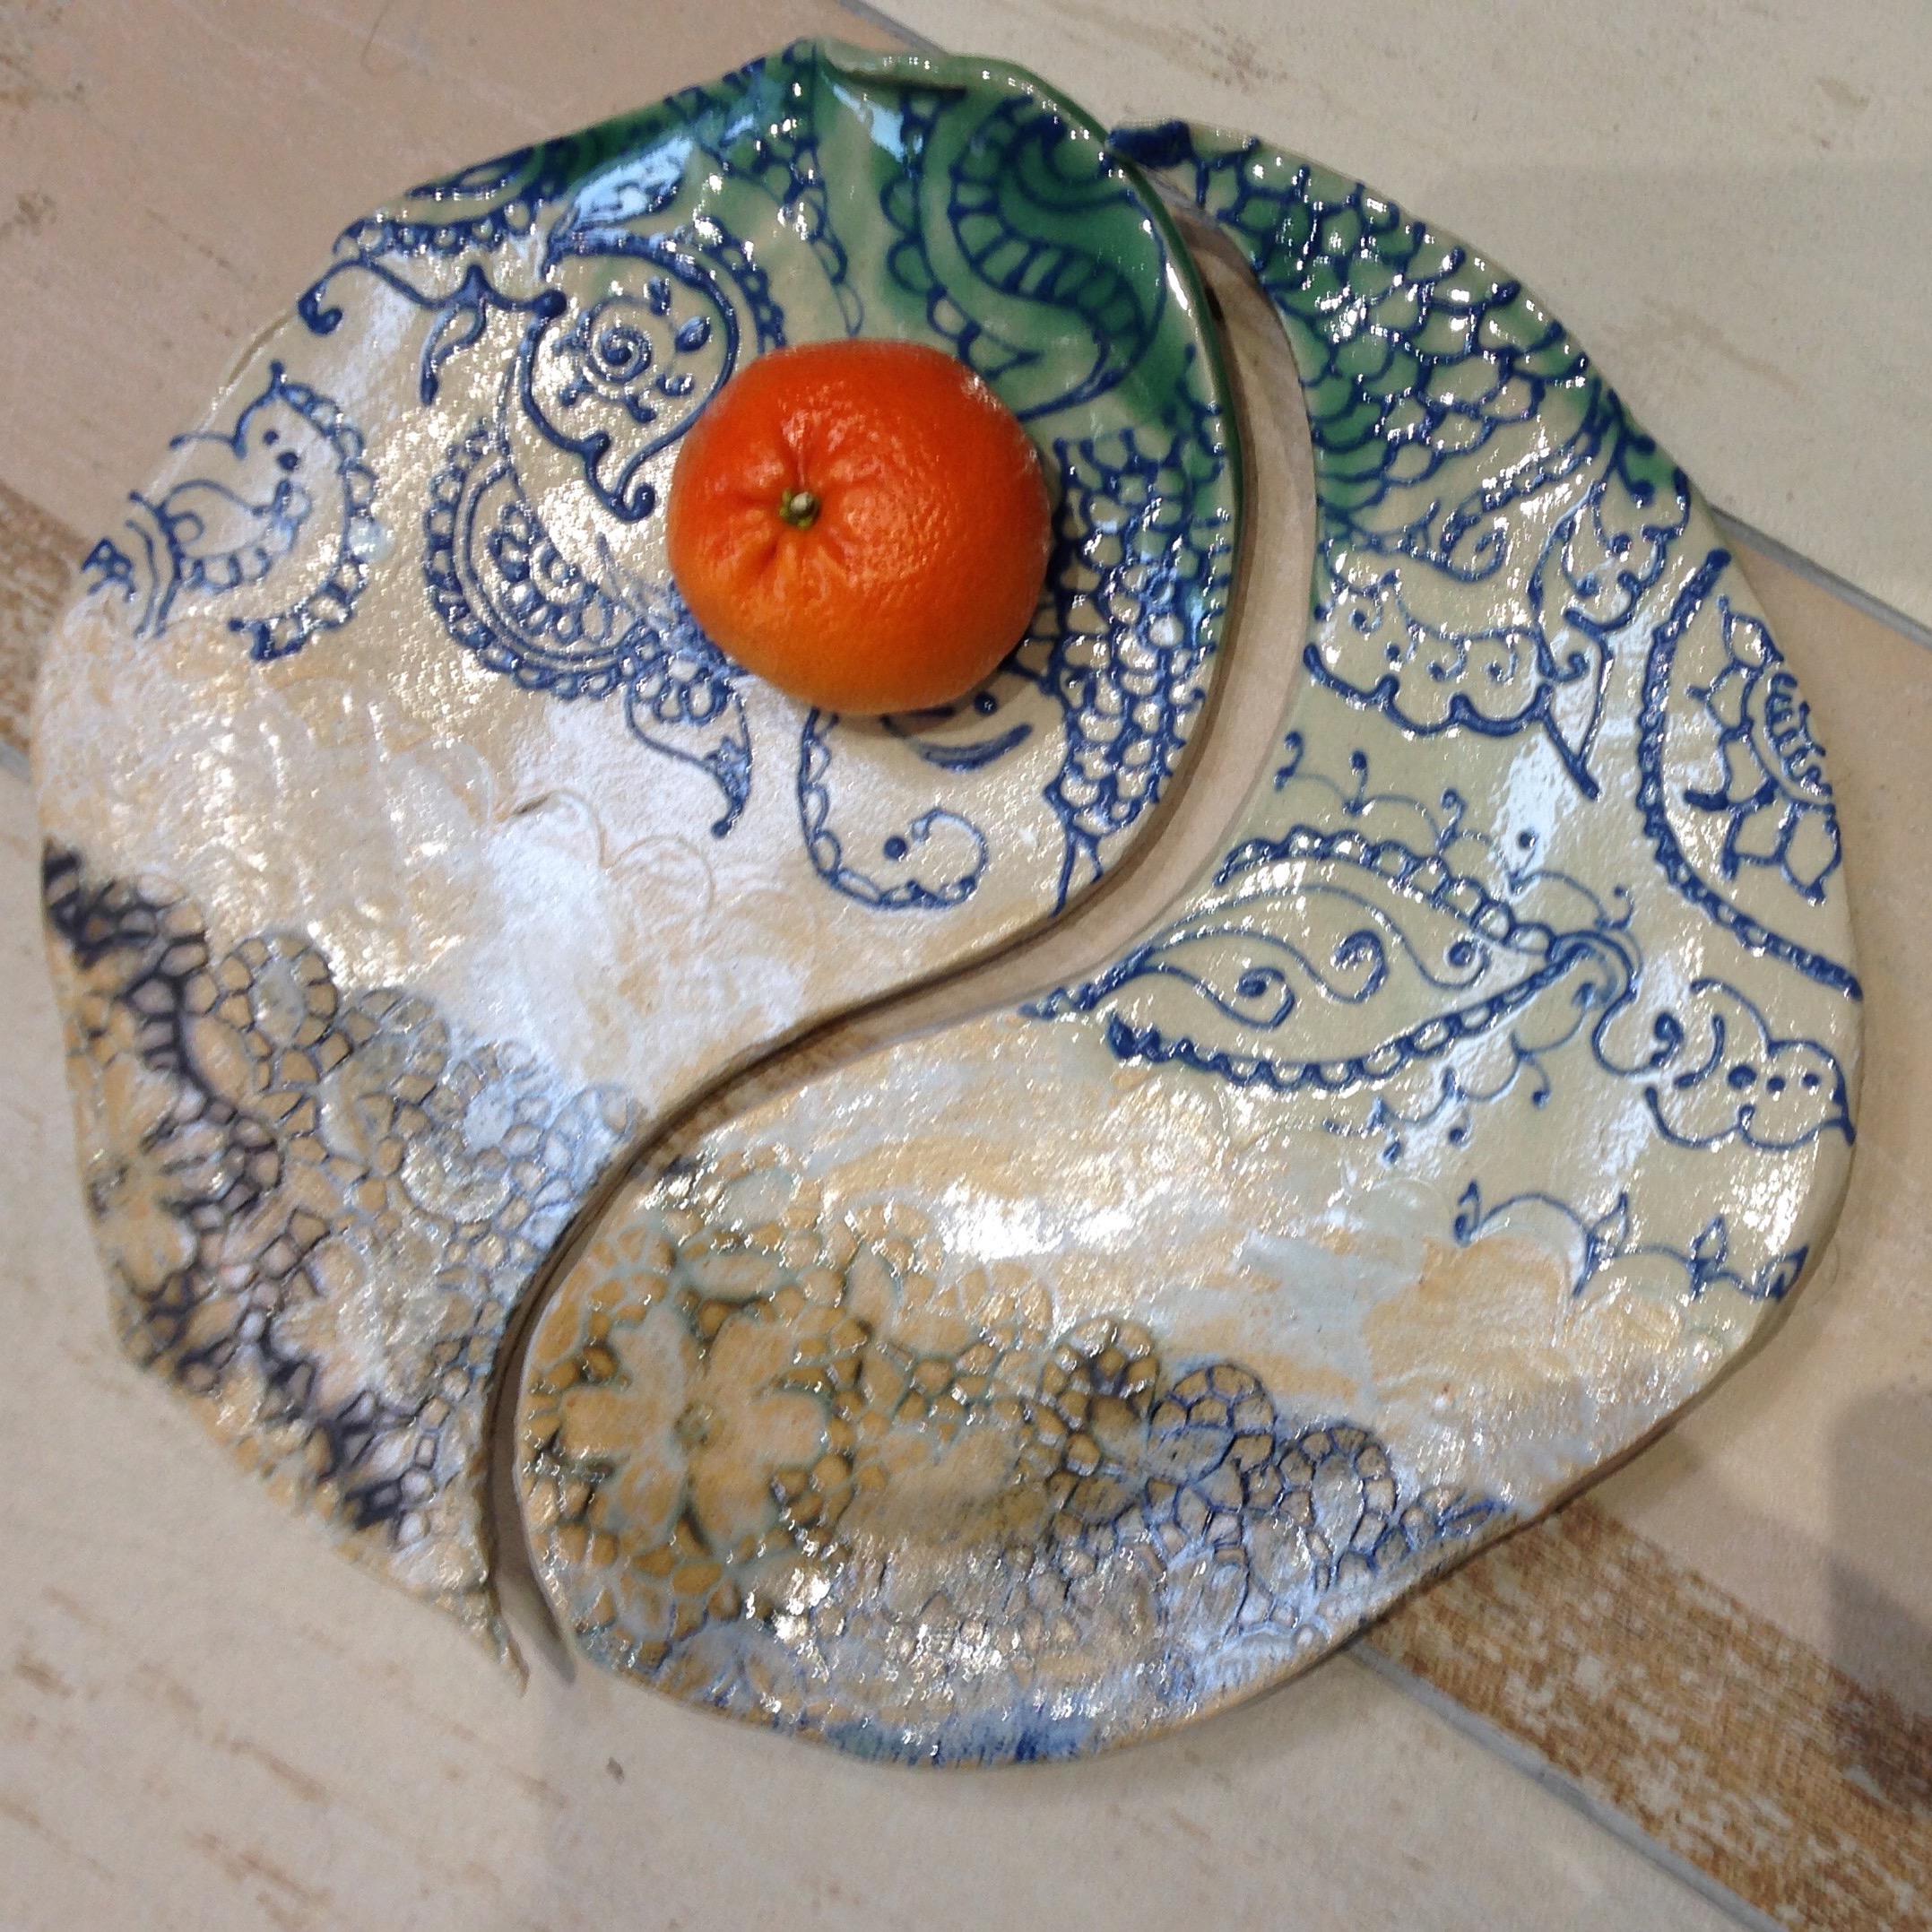 Yin & Yang platters - Sold